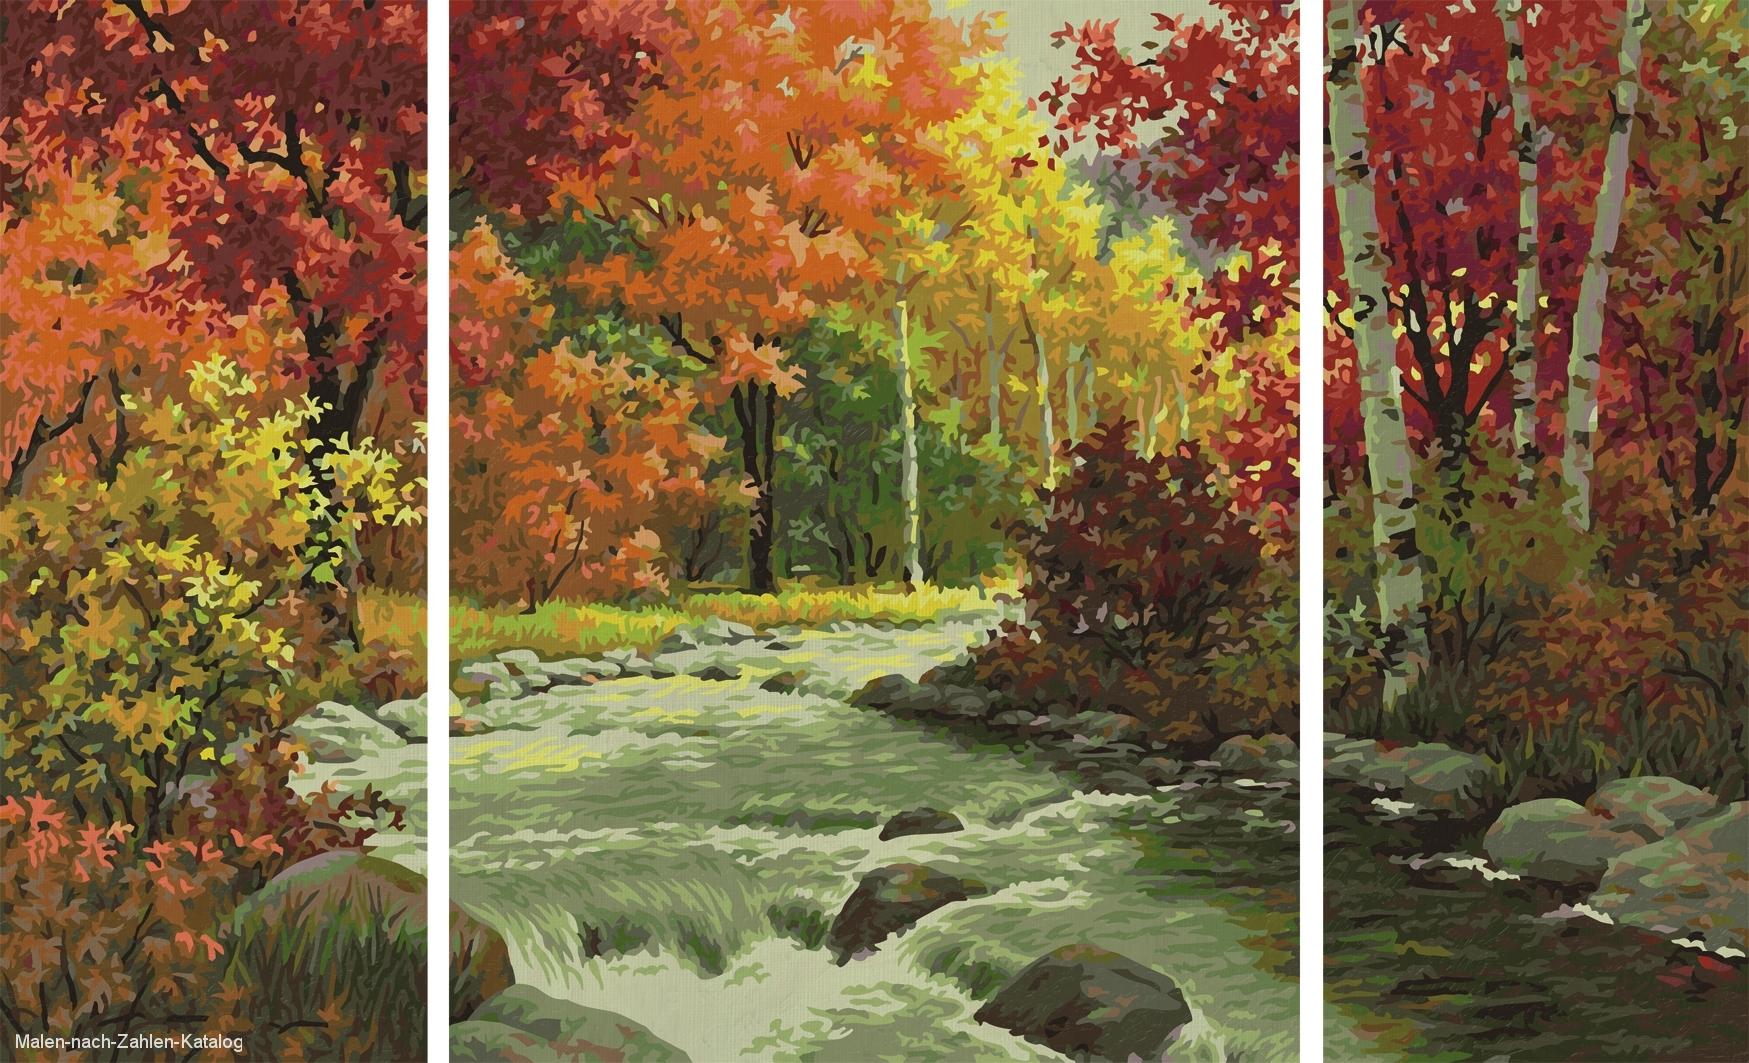 Schipper Malen nach Zahlen Triptychon 80x50cm Flusslandschaft